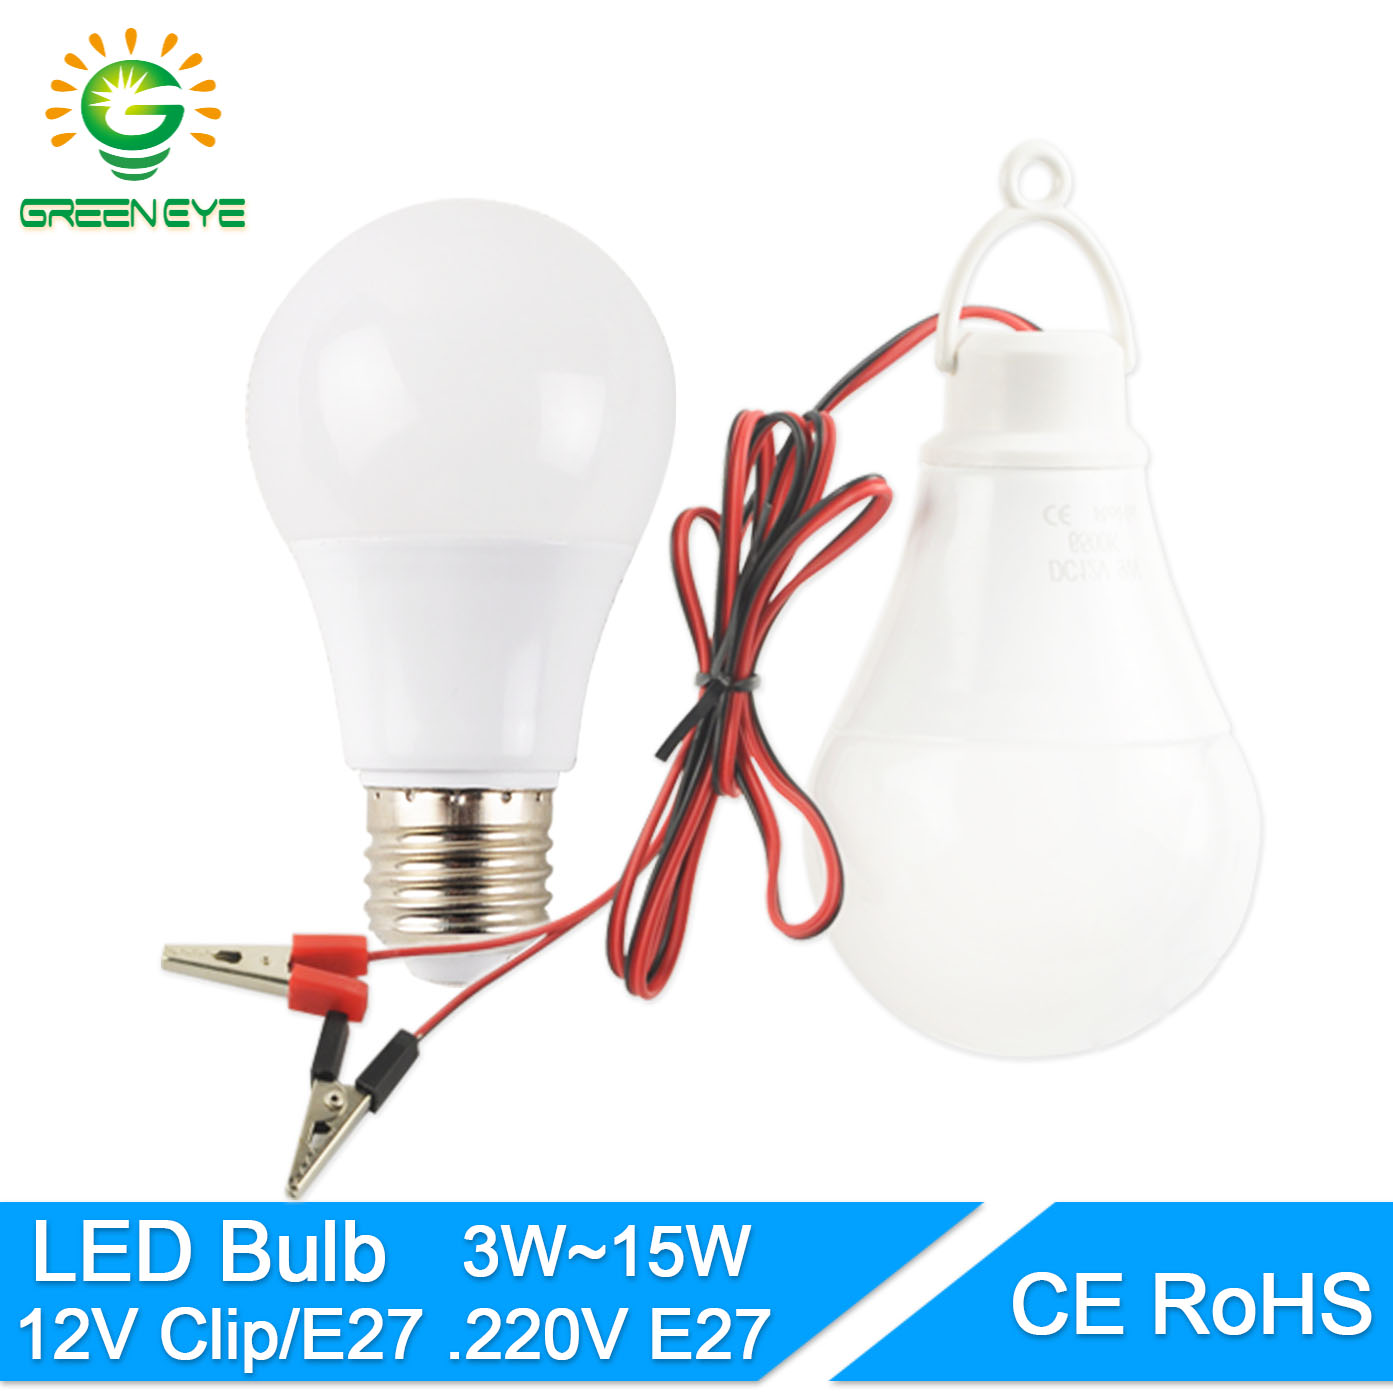 GreenEye-Cable-E27-DC-12V-LED-Bulb-3W-5W-7W-9W-12W-15W-LED-Lamp-For Faszinierend Led E27 12 Watt Dekorationen